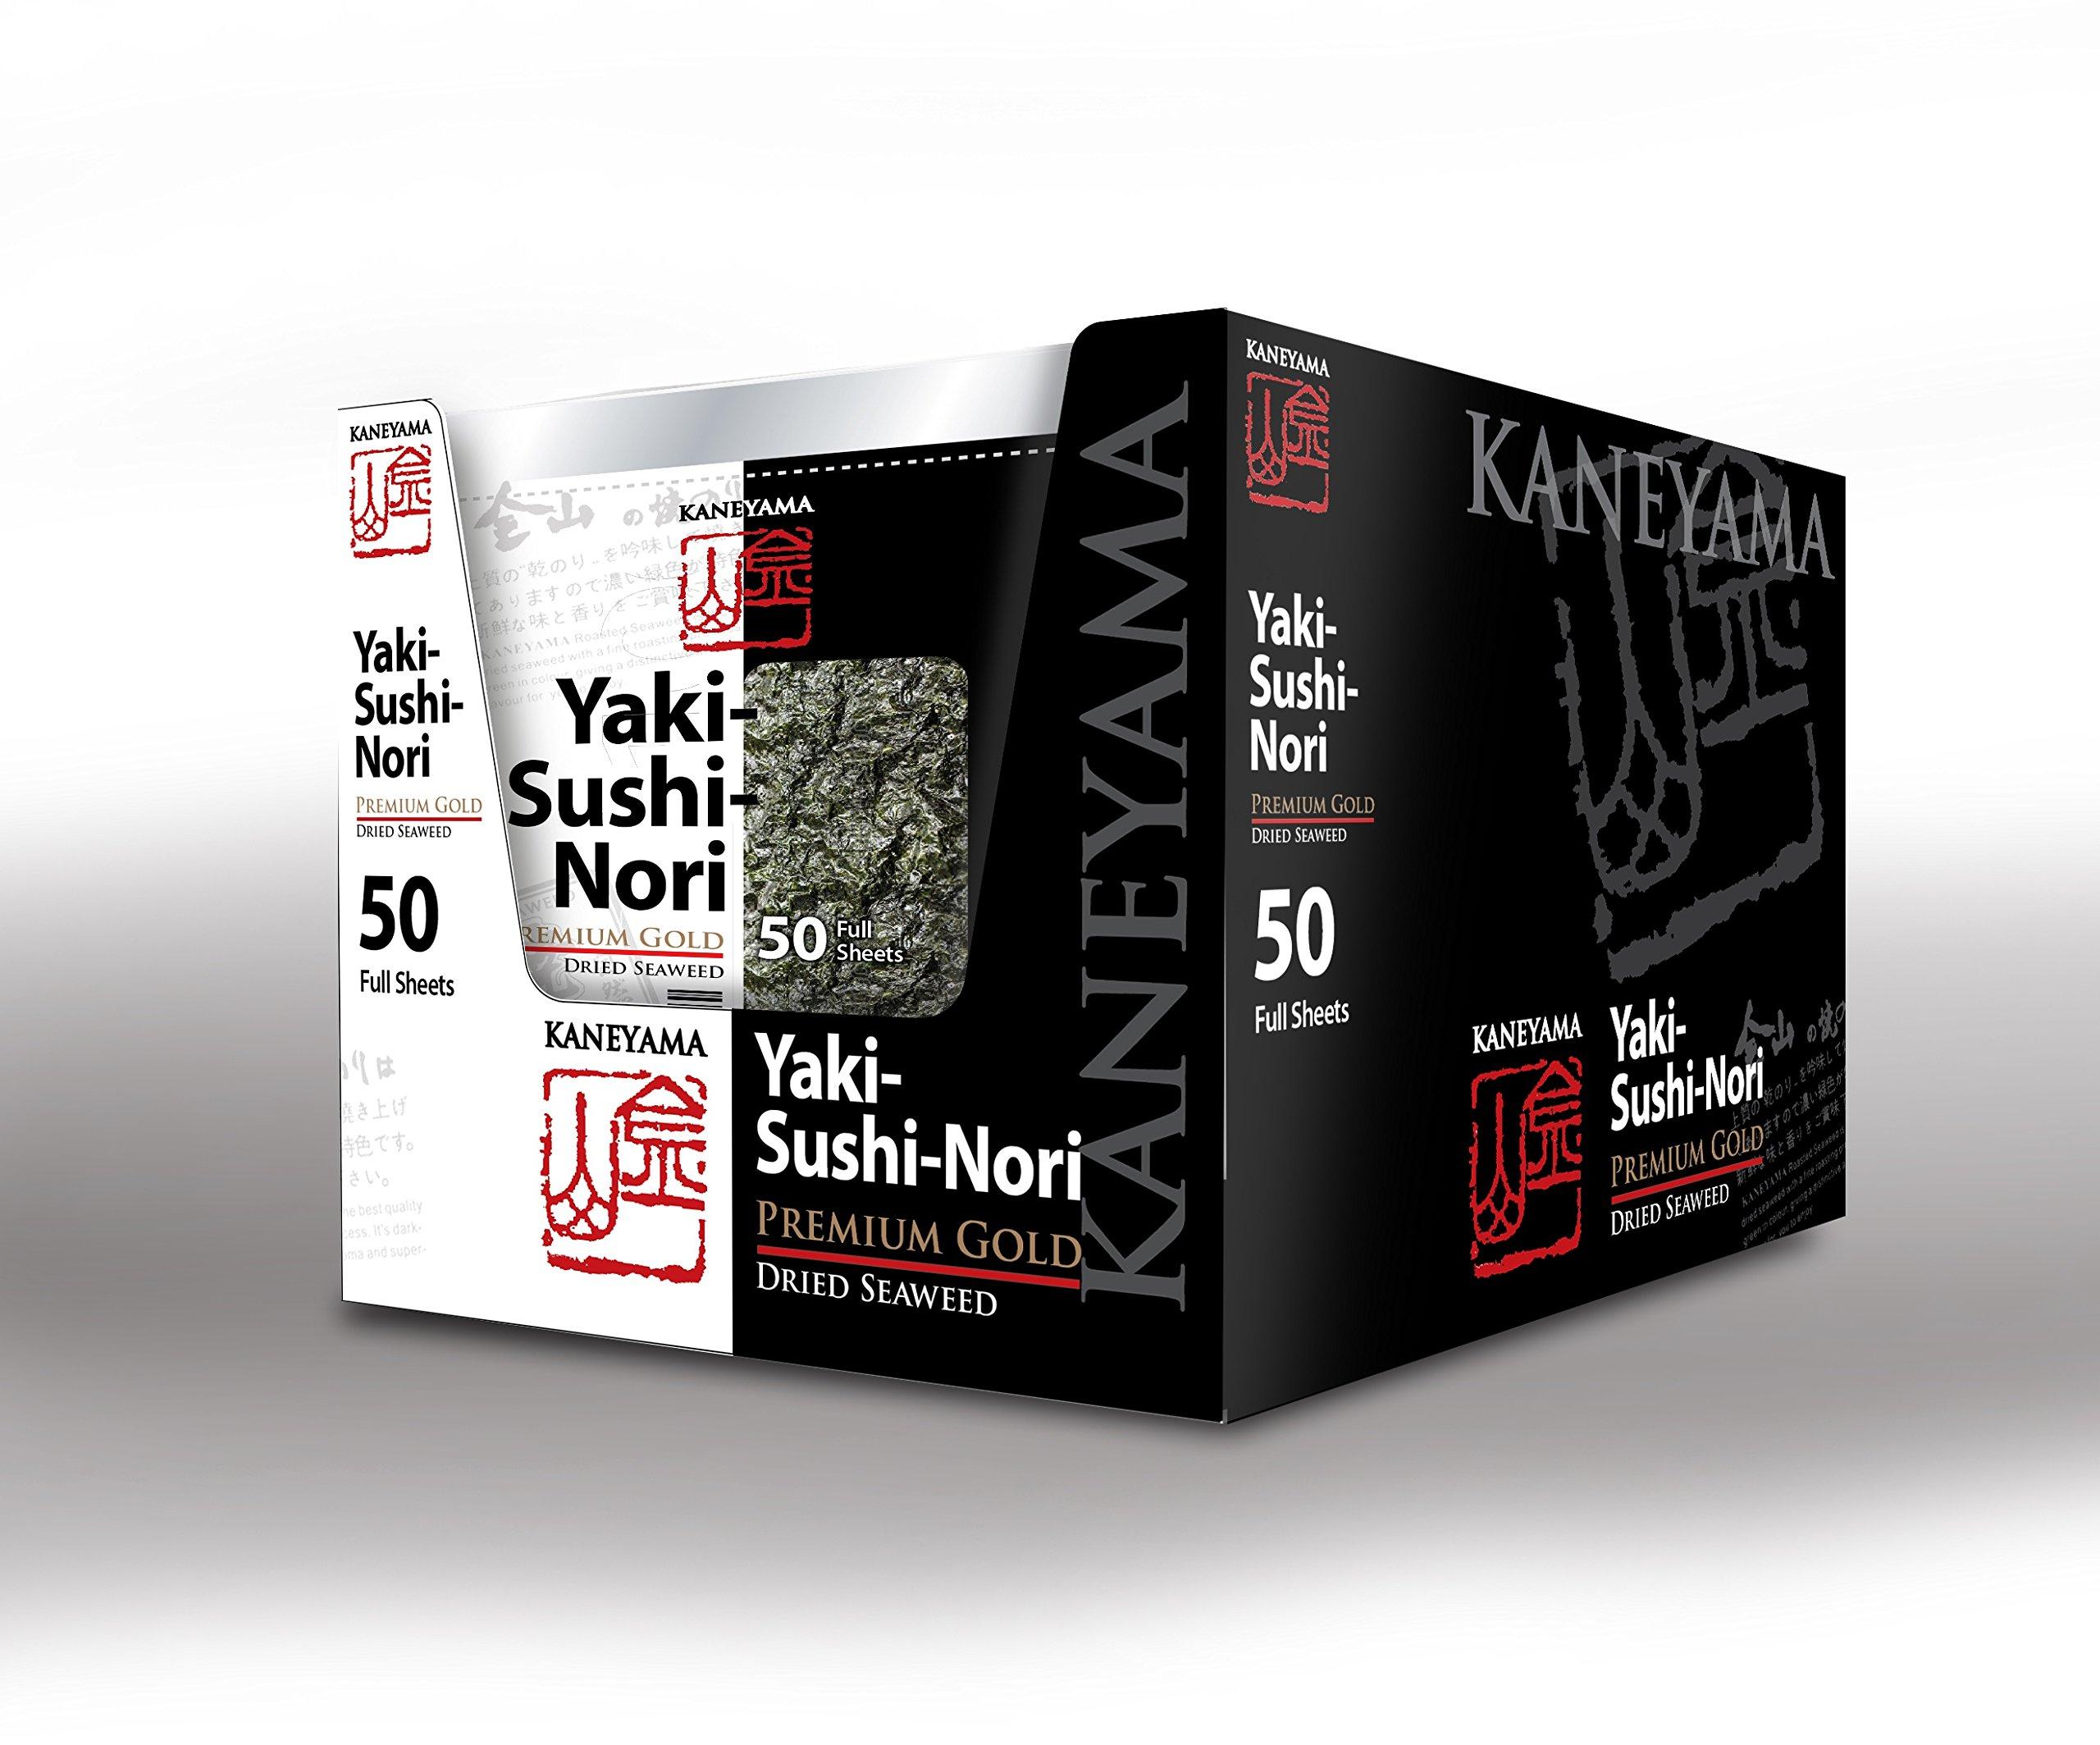 Kaneyama Yaki Sushi Nori / Dried Seaweed (Vacuum-packed/re-sealable), Premium Gold Grade (Full Size 50 Sheets 10 Packs)